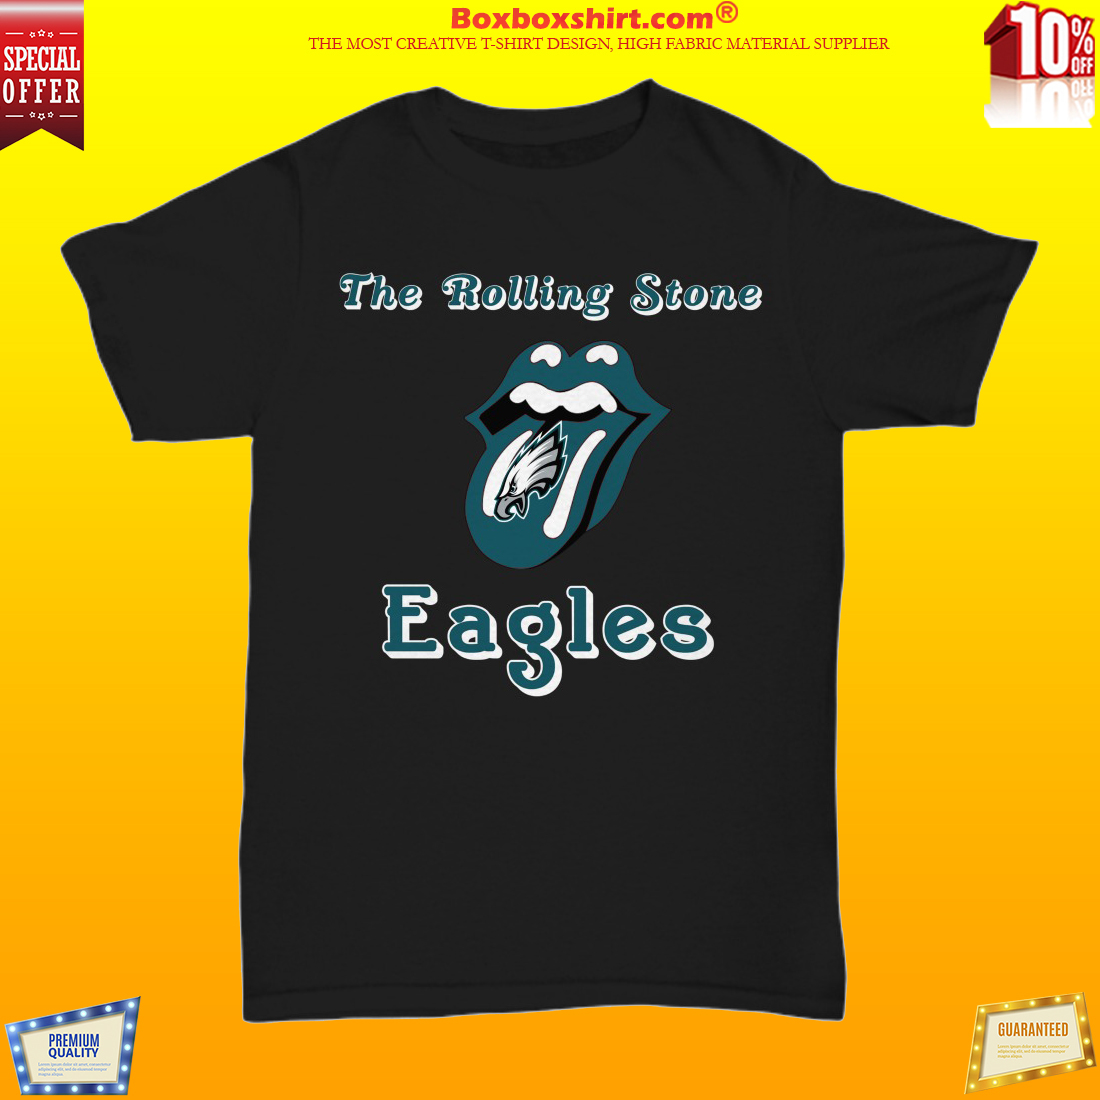 The rolling stone Philadelphia Eagles shirt